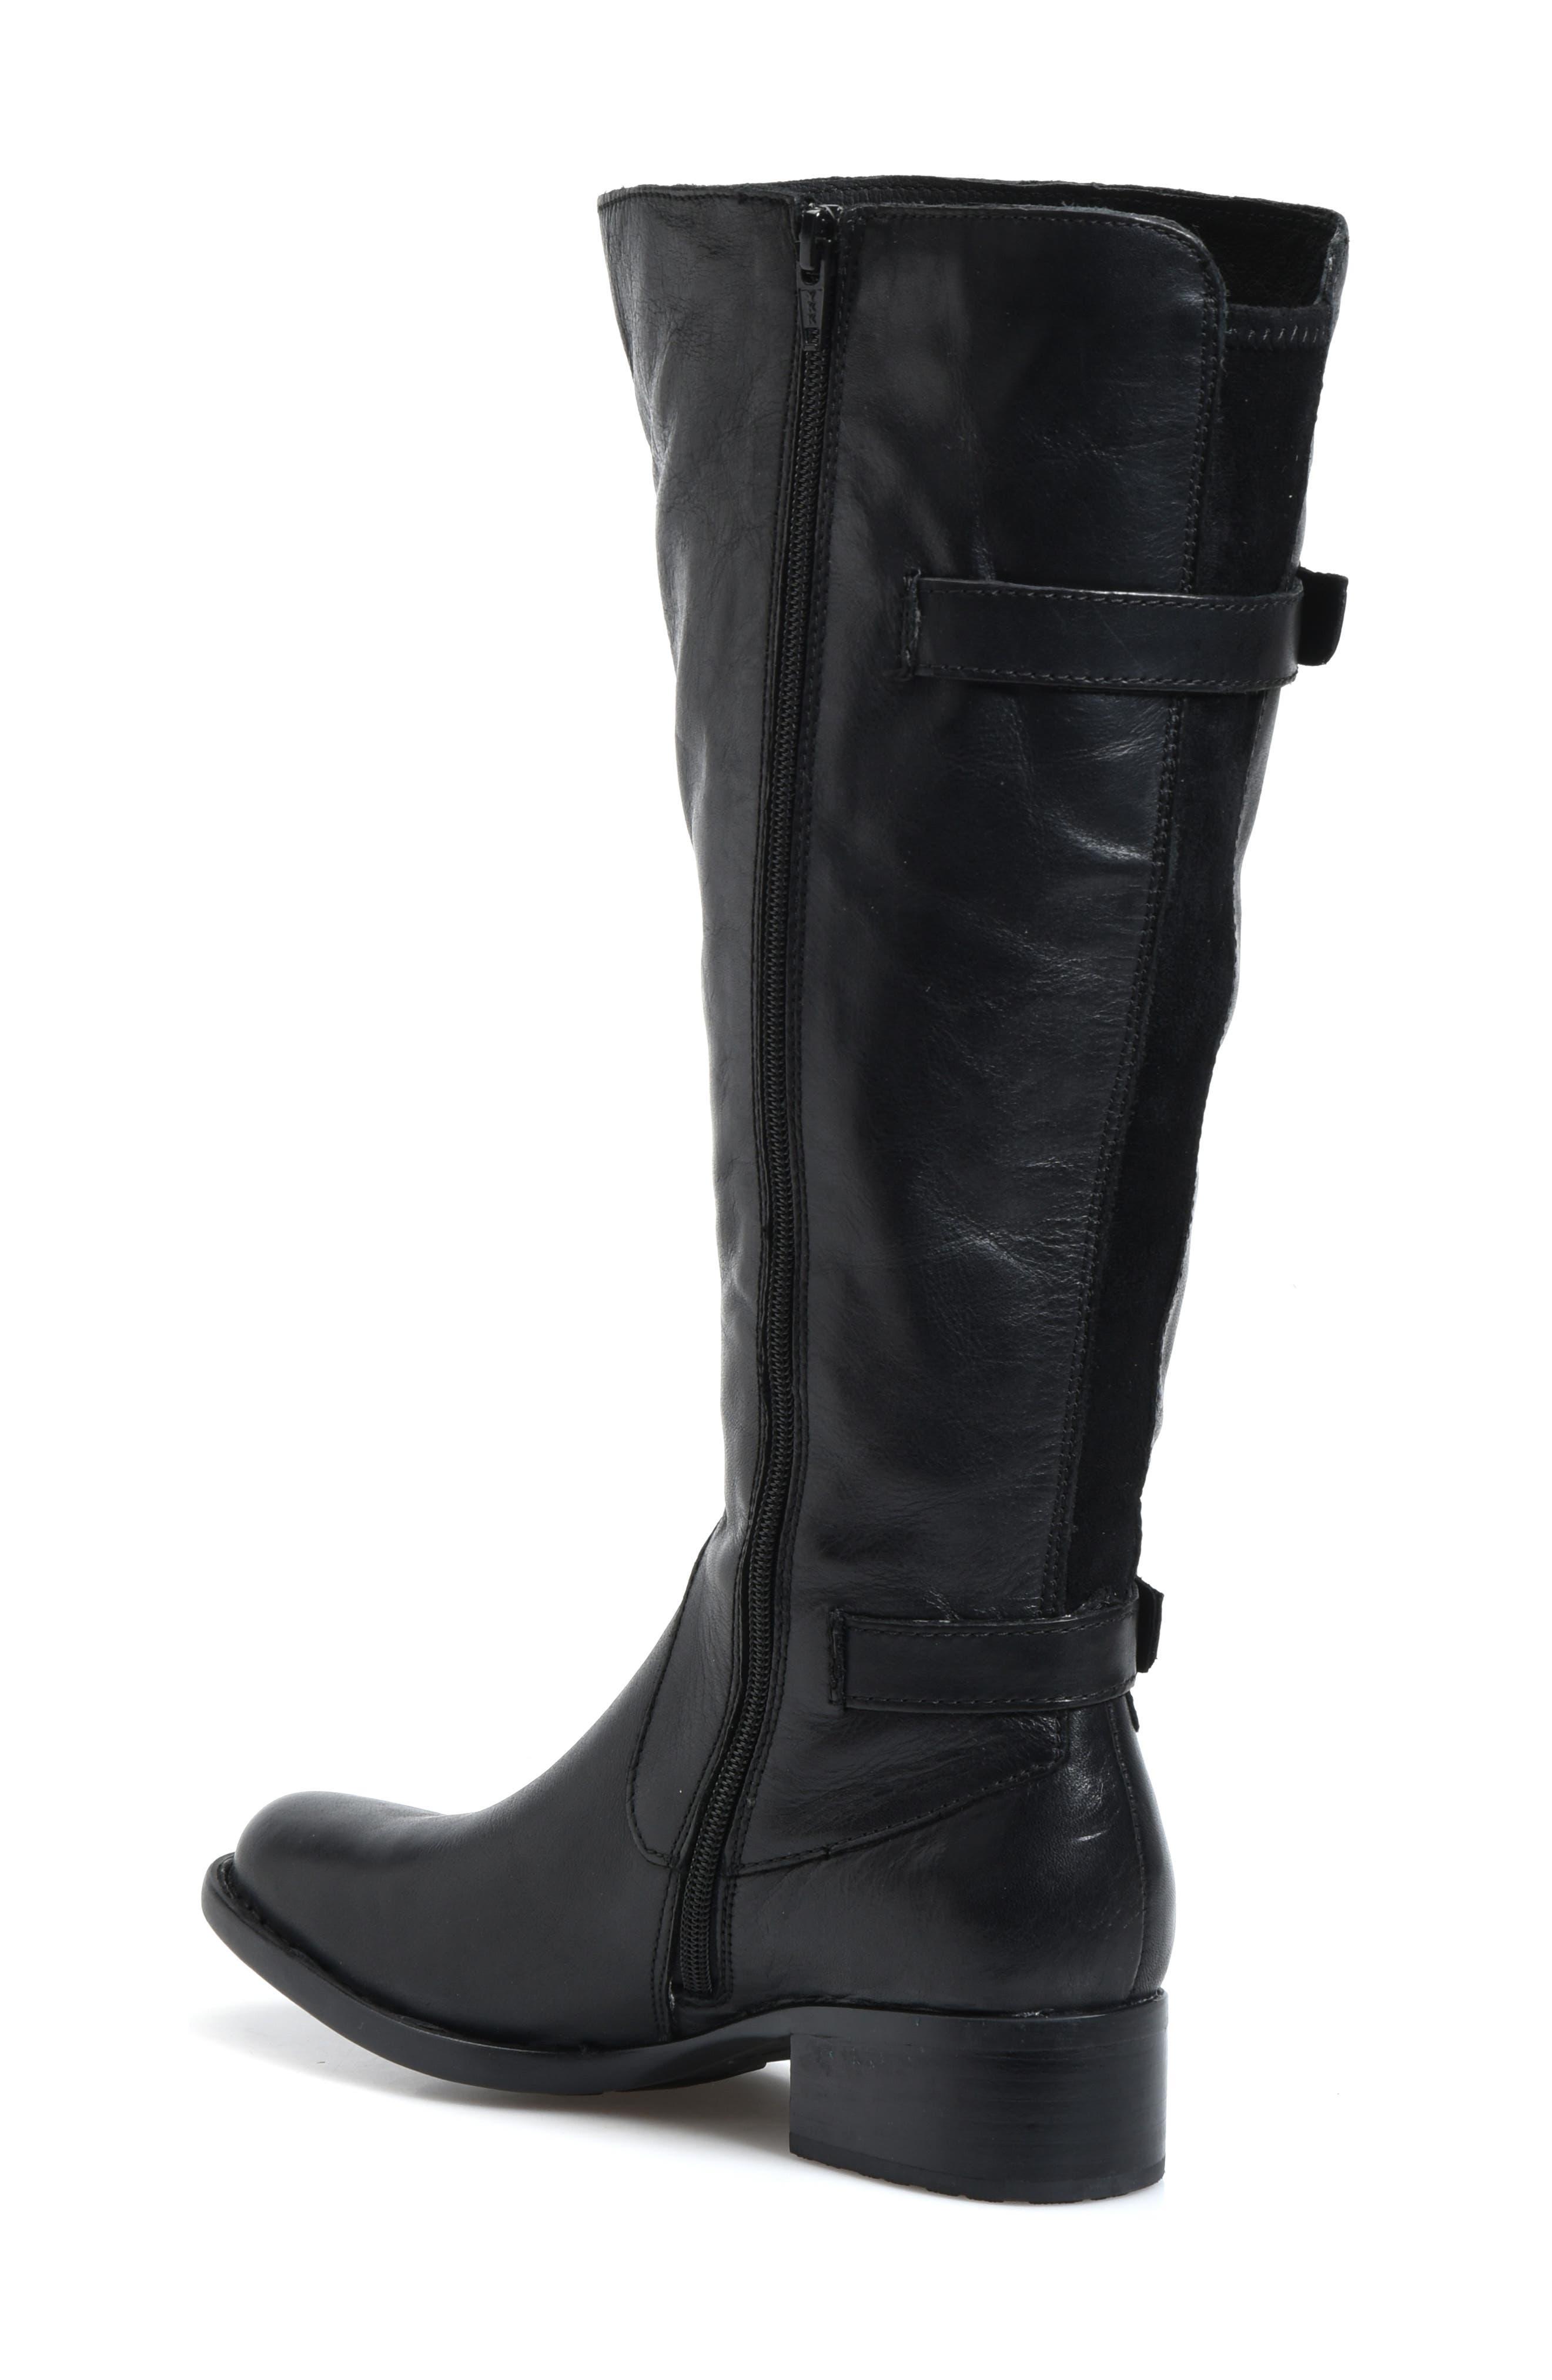 BØRN, Gibb Knee High Riding Boot, Alternate thumbnail 2, color, BLACK LEATHER